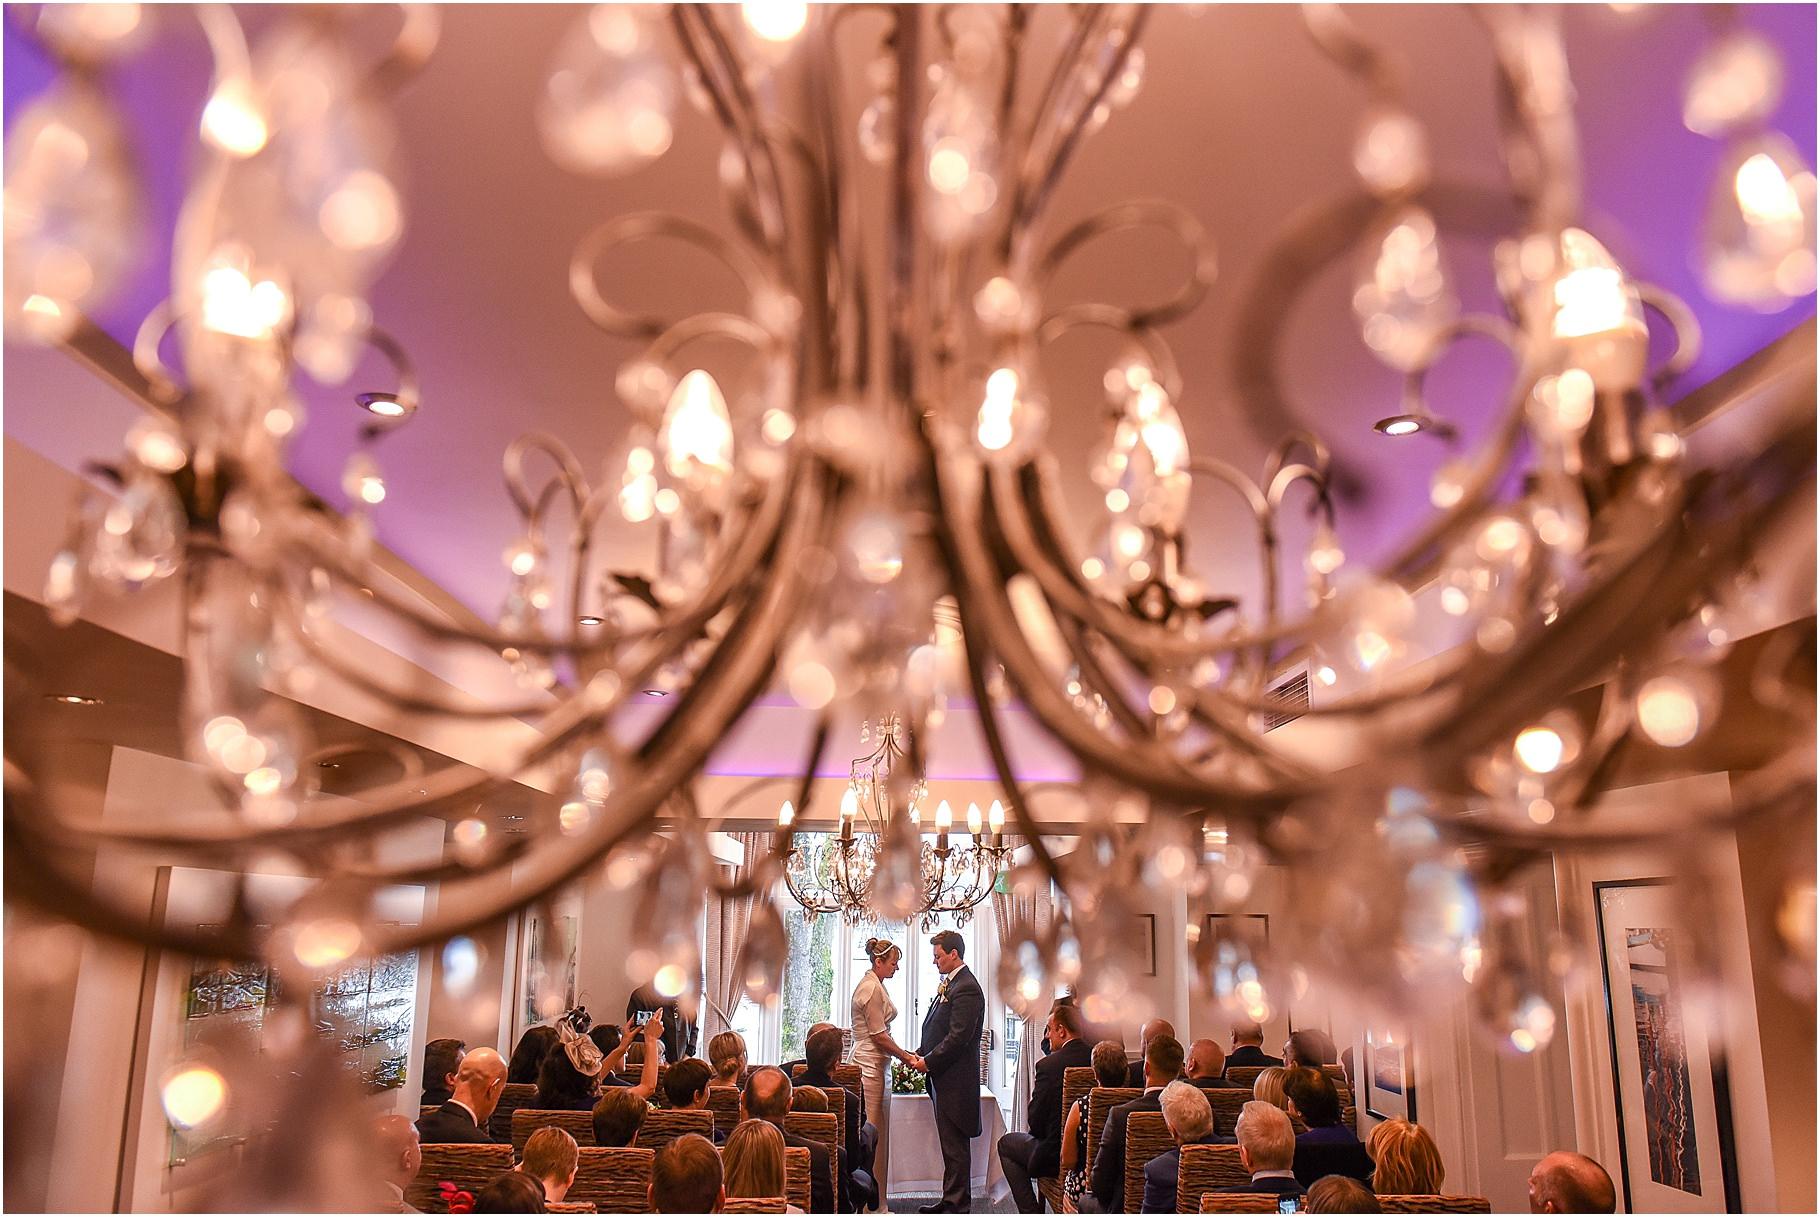 dan-wootton-photography-2017-weddings-112.jpg